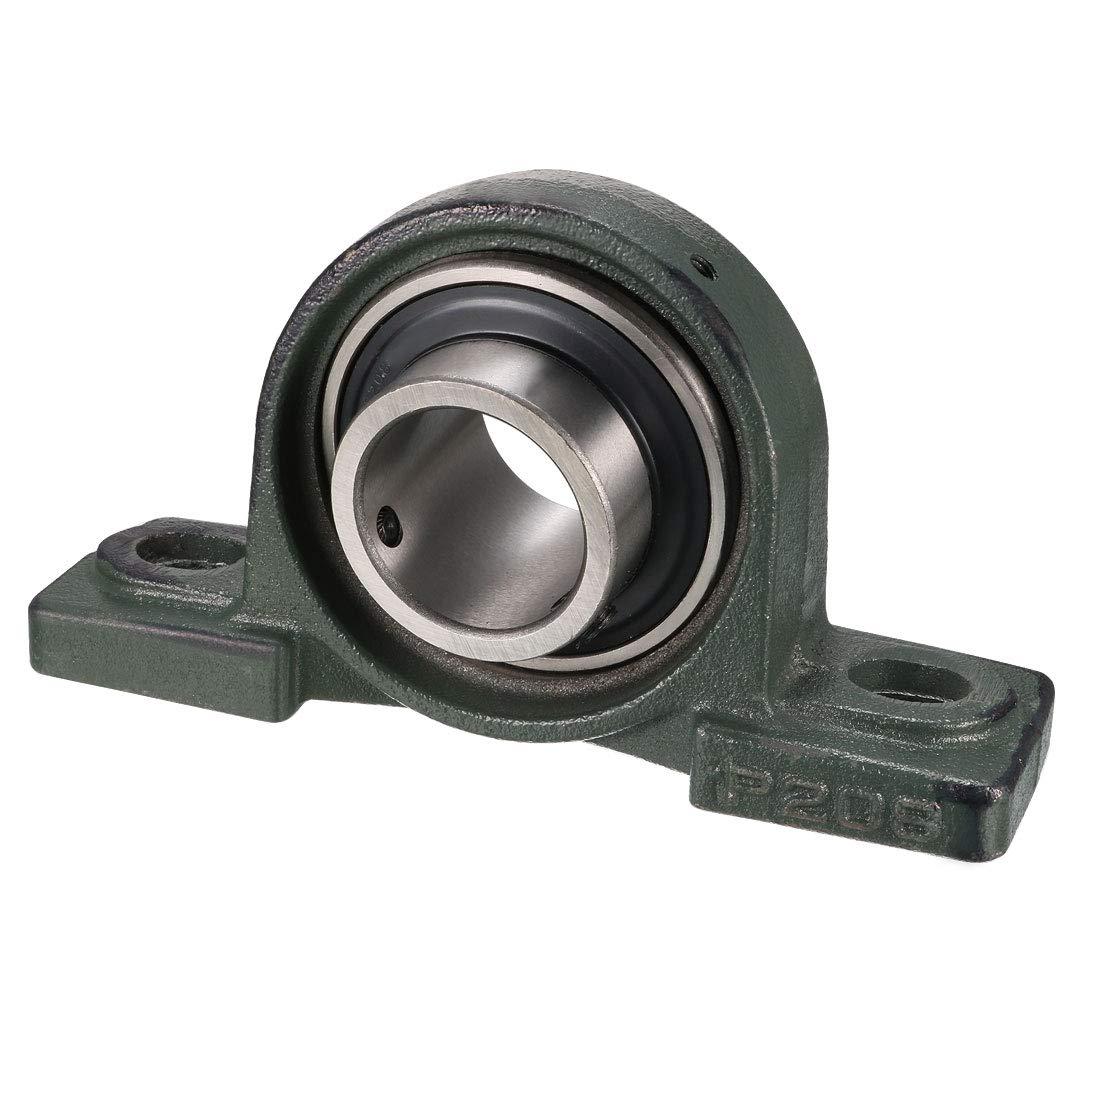 Sourcingmap - Cojinete para cojín, hierro fundido/acero cromado, tornillo de bloqueo, UCP208